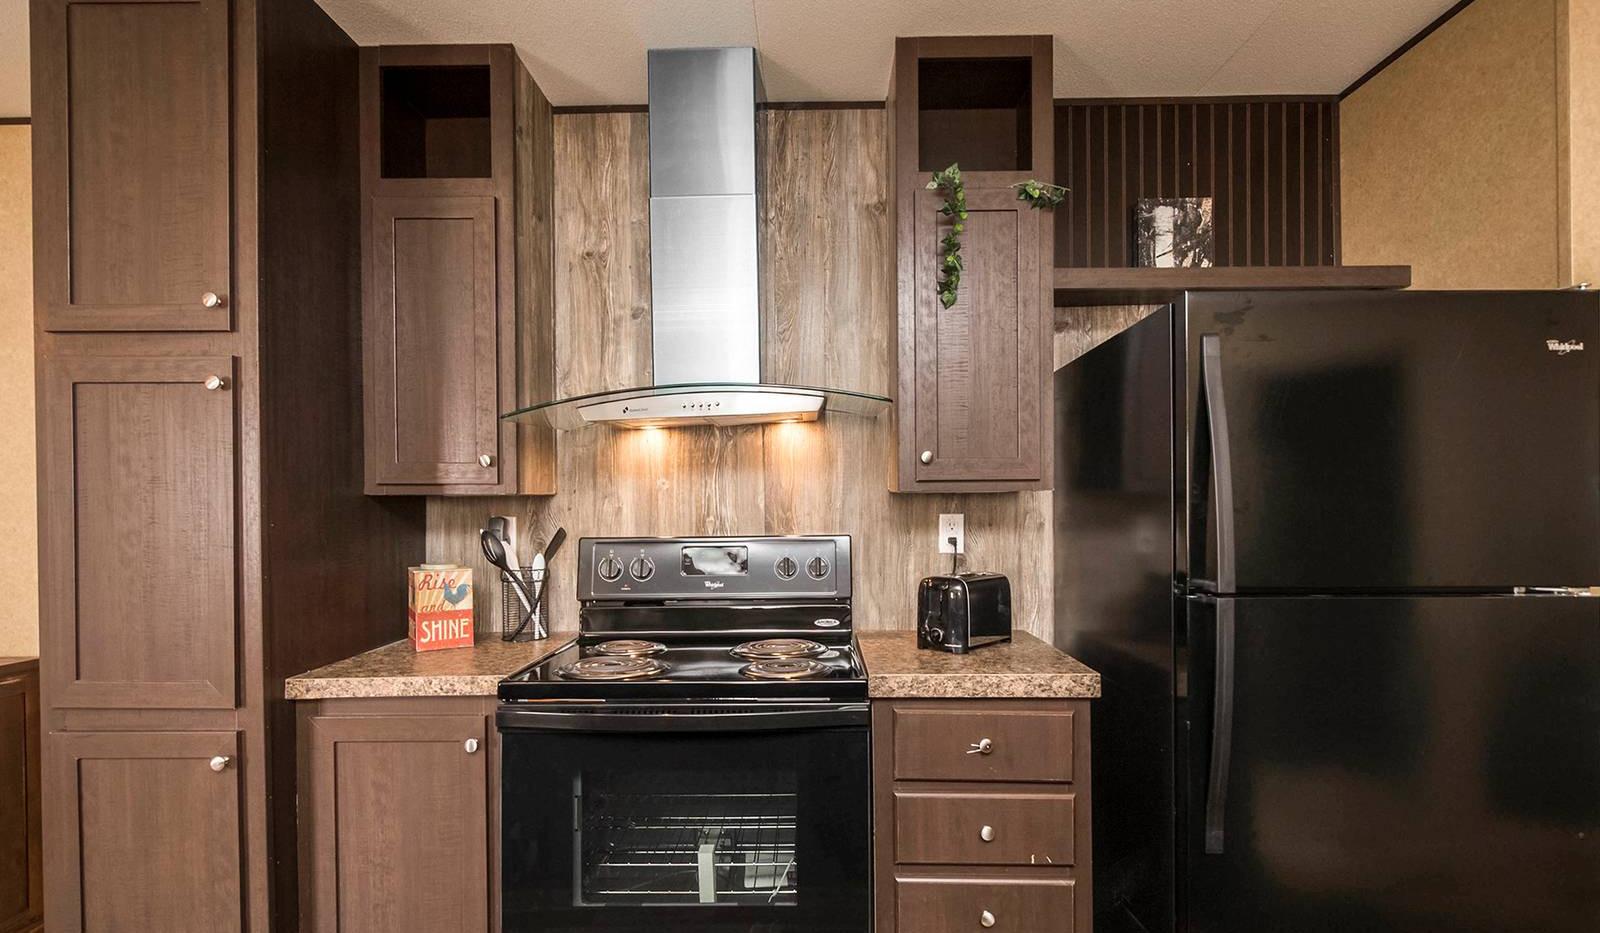 4-puebla-kitchen-4-corrected-1600x1067.j